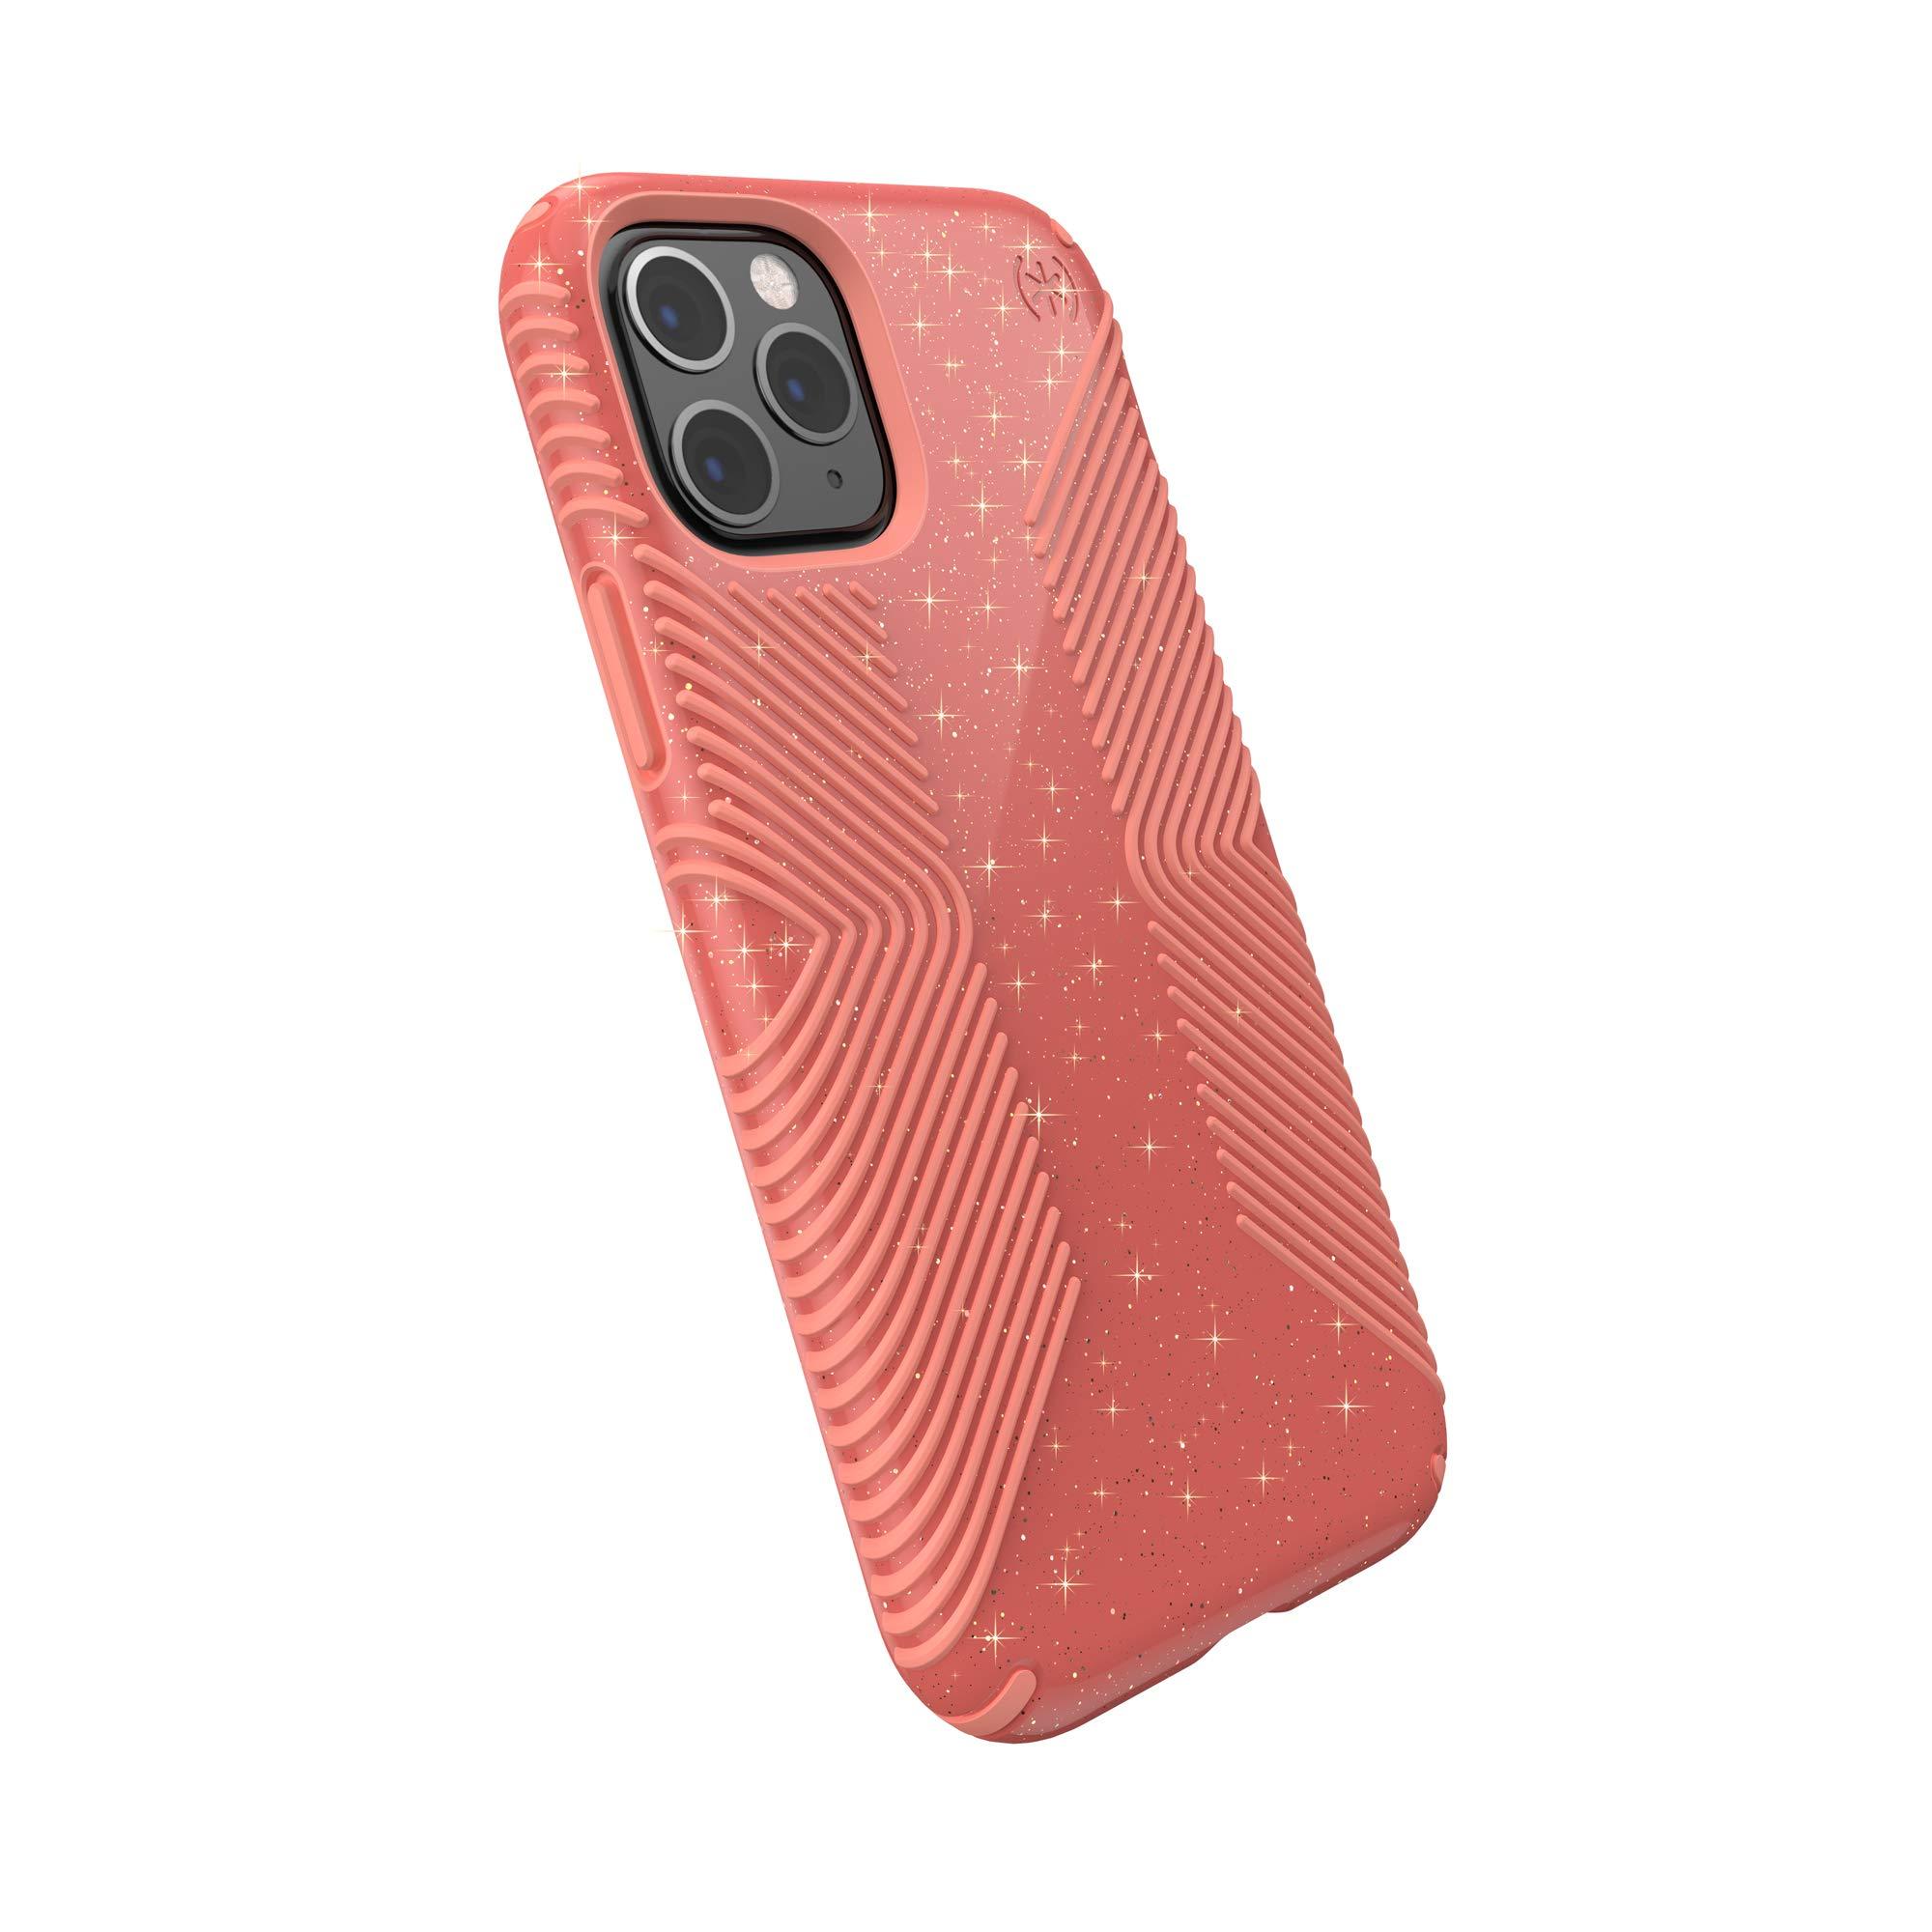 Speck Products Presidio Grip + Glitter iPhone 11 Pro Case, Lilypink Glitter/Papaya Pink